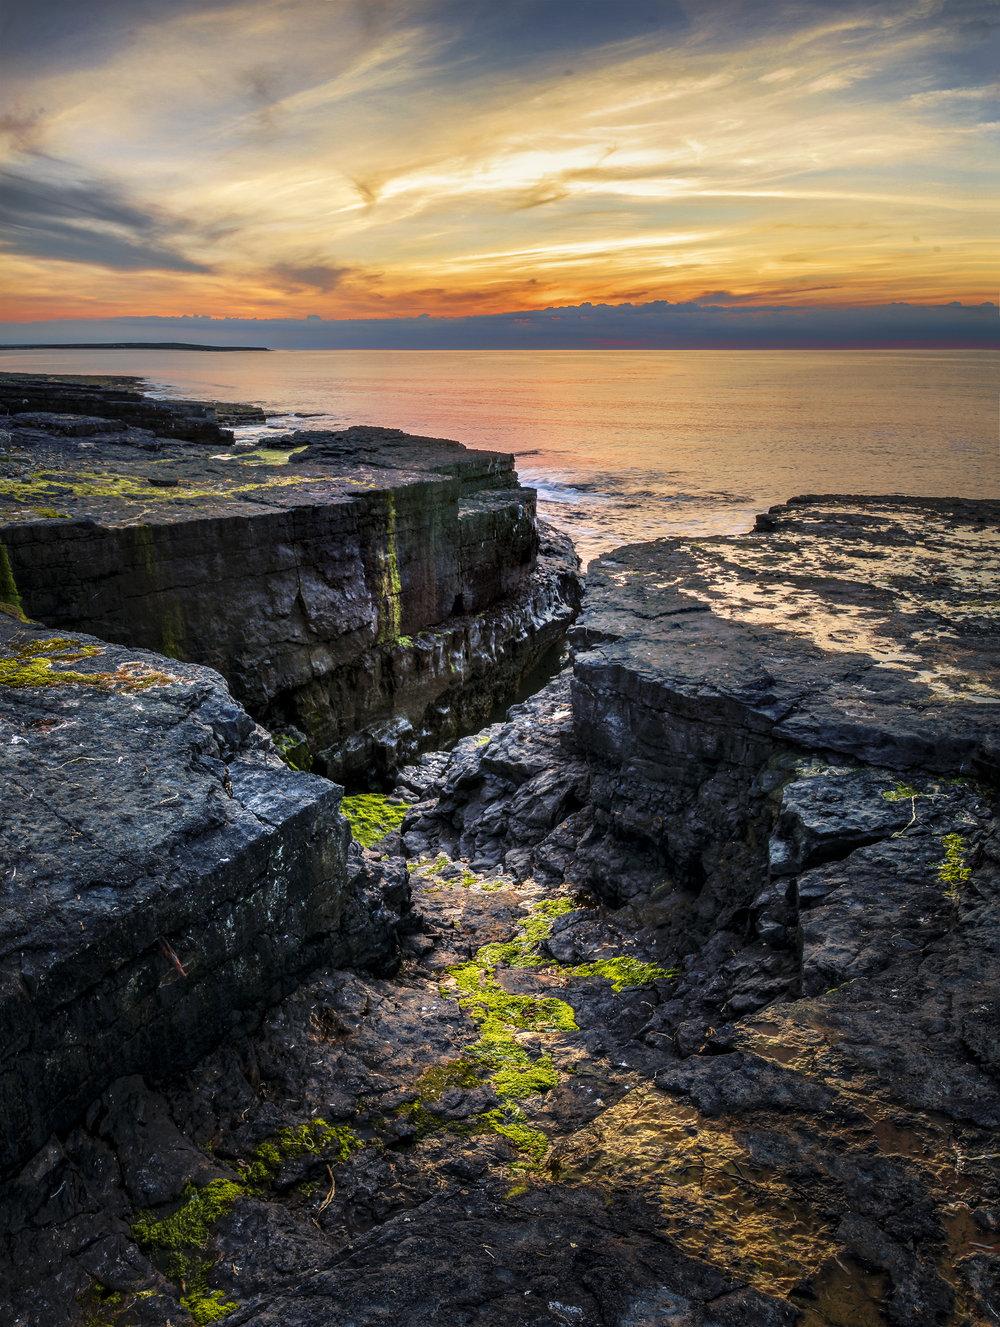 SunsetSligoCliffs_smaller.jpg